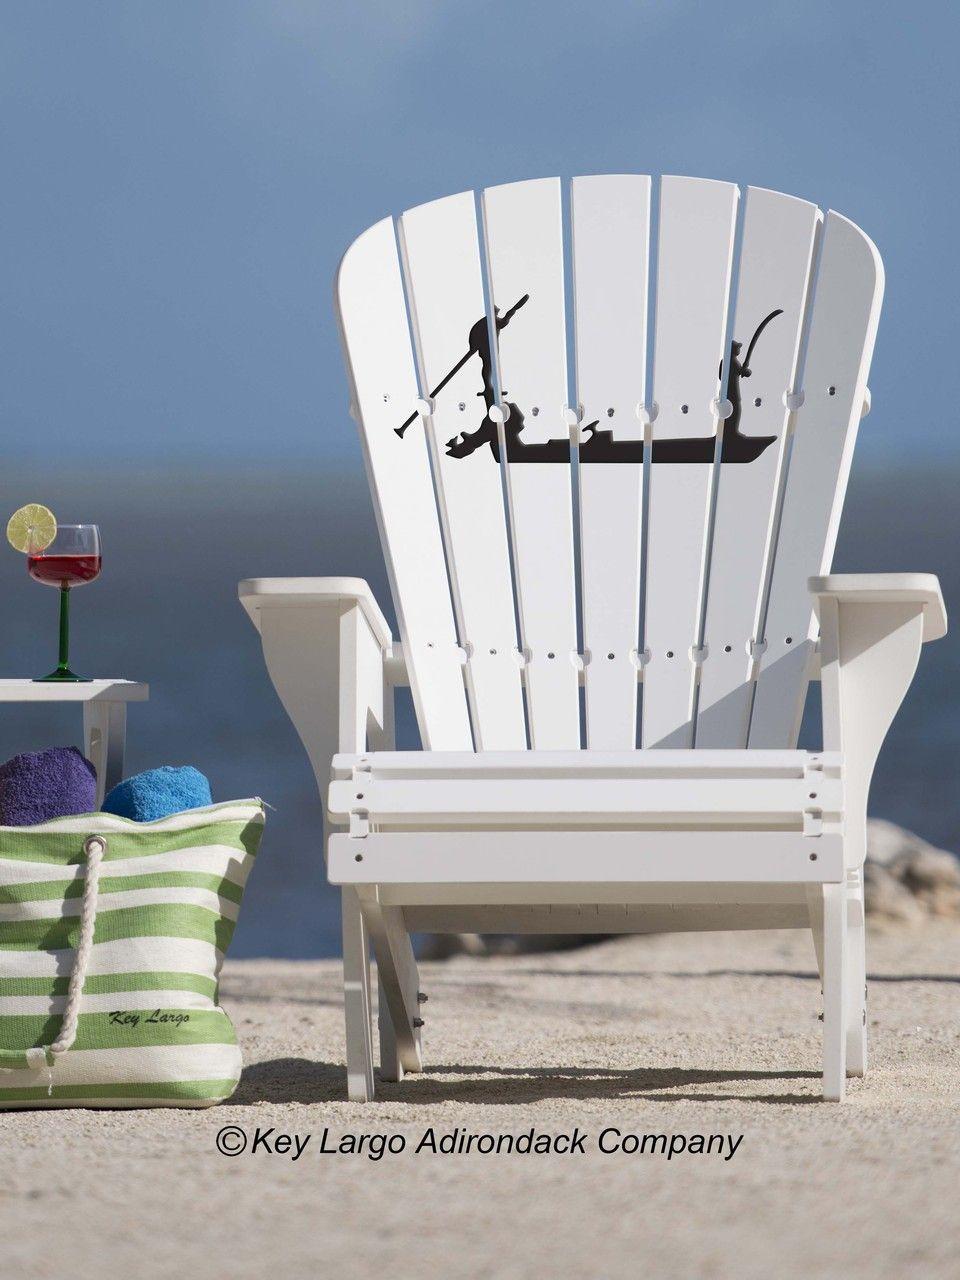 Amazing Key Largo Adirondack Company   Flatsboat Adirondack Chair, $359.99  (http://www · University Of FloridaKey LargoAdirondack ChairsFlorida  GatorsRocking ...